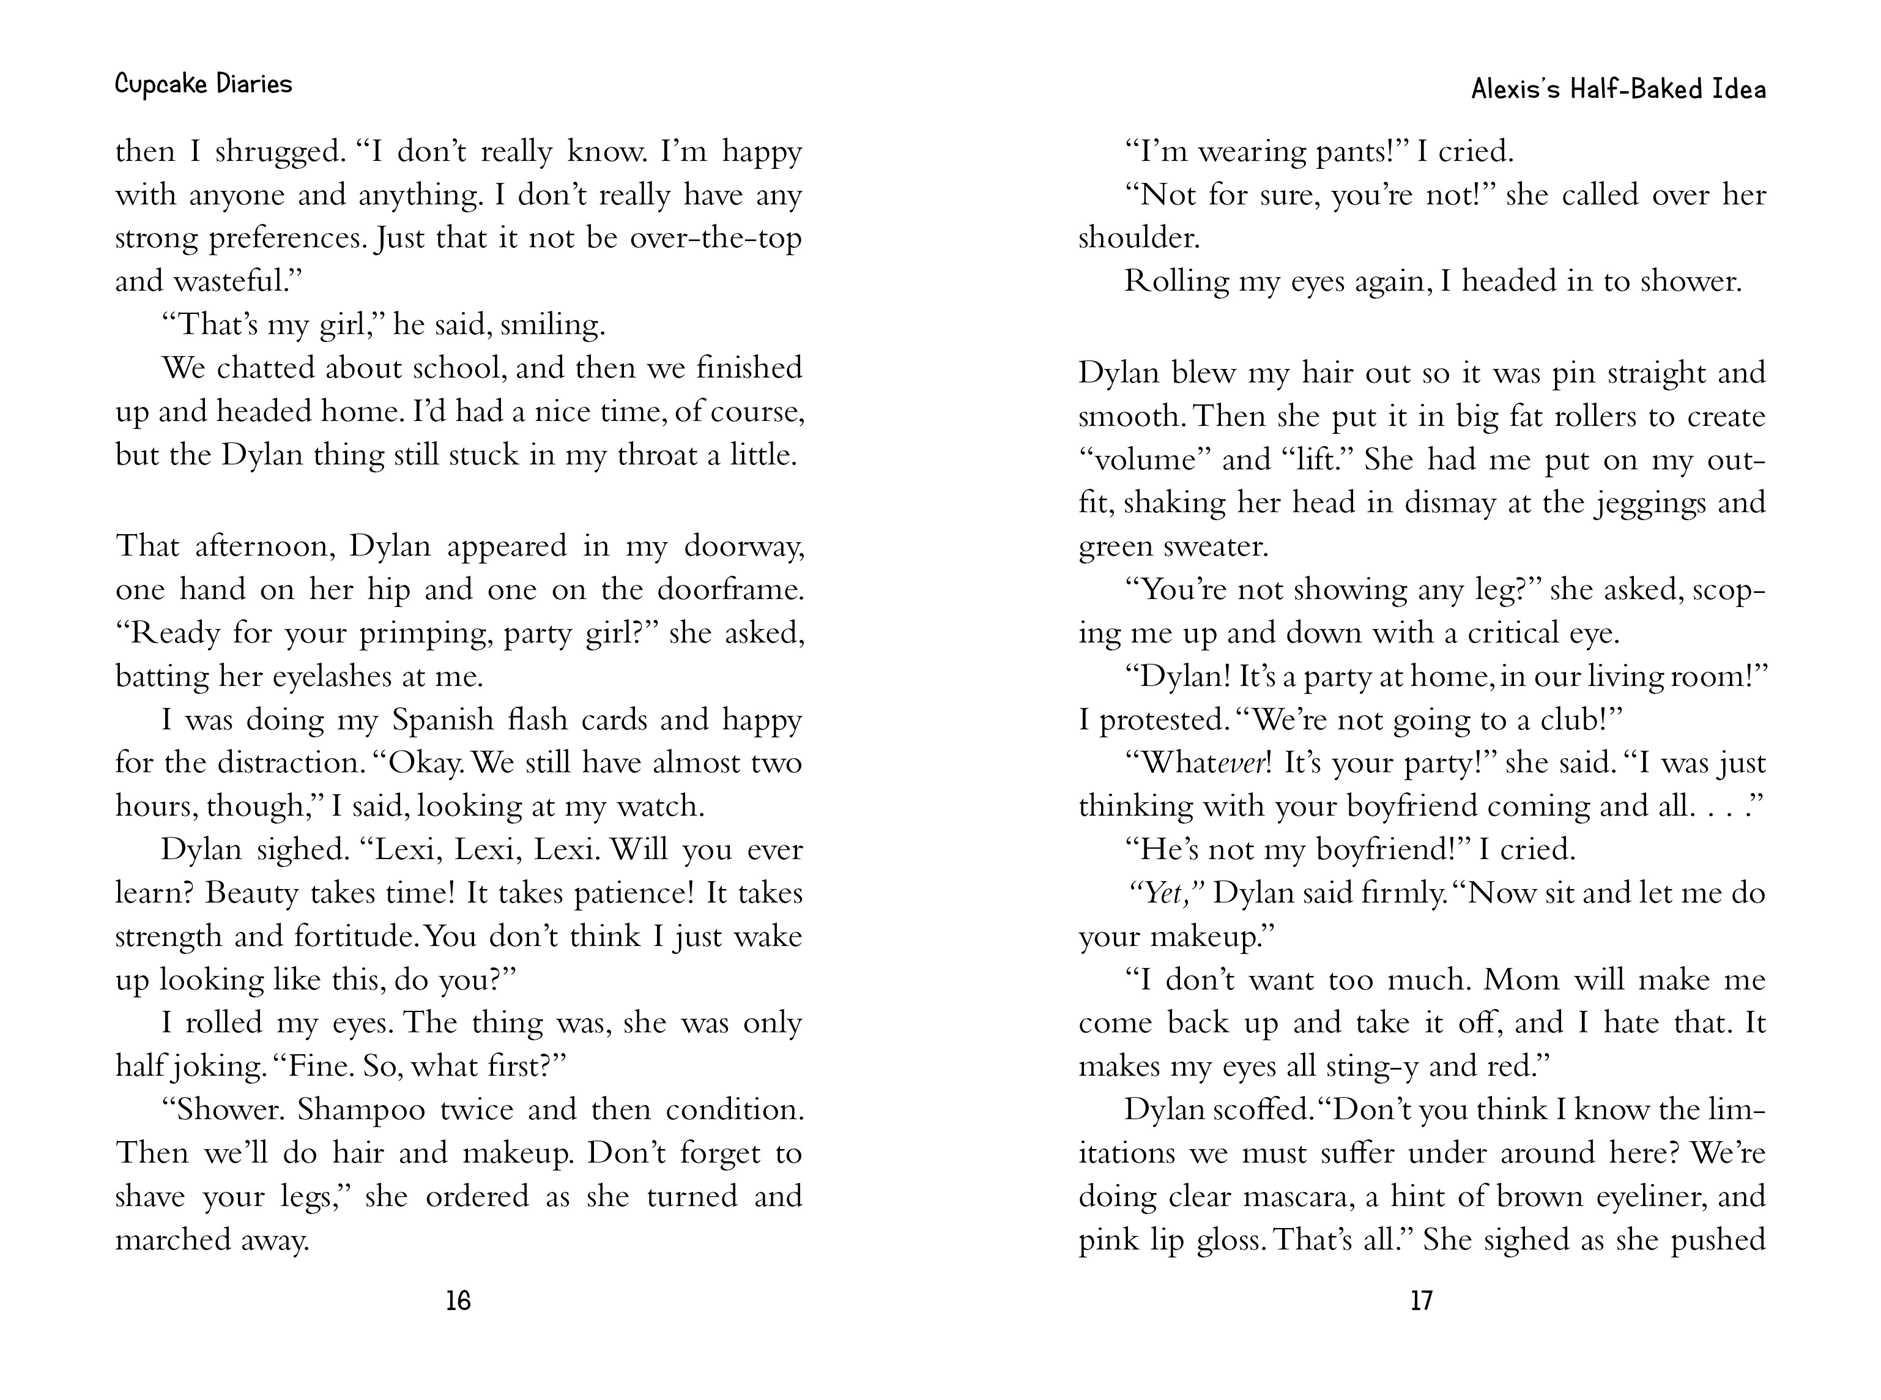 Alexis's Half-Baked Idea | Book by Coco Simon, Tracy Bishop